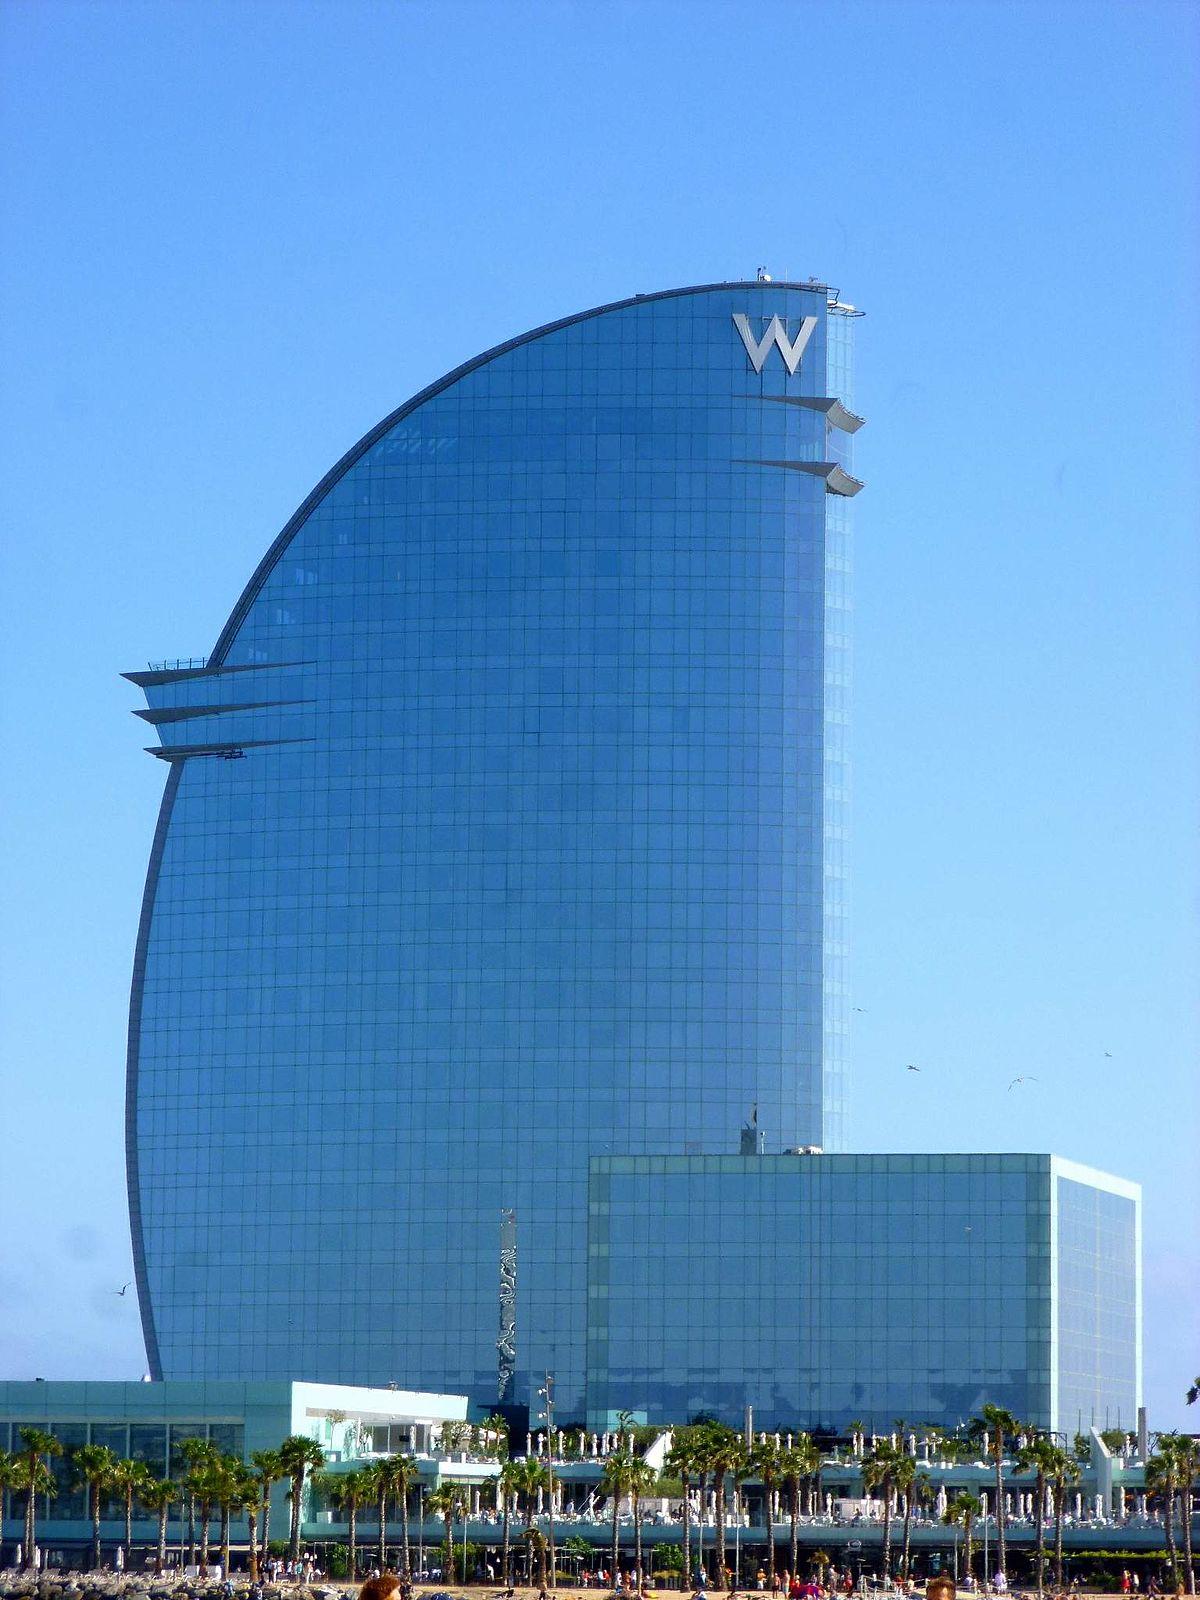 Barcelona - Hotel W Barcelona (01).jpg